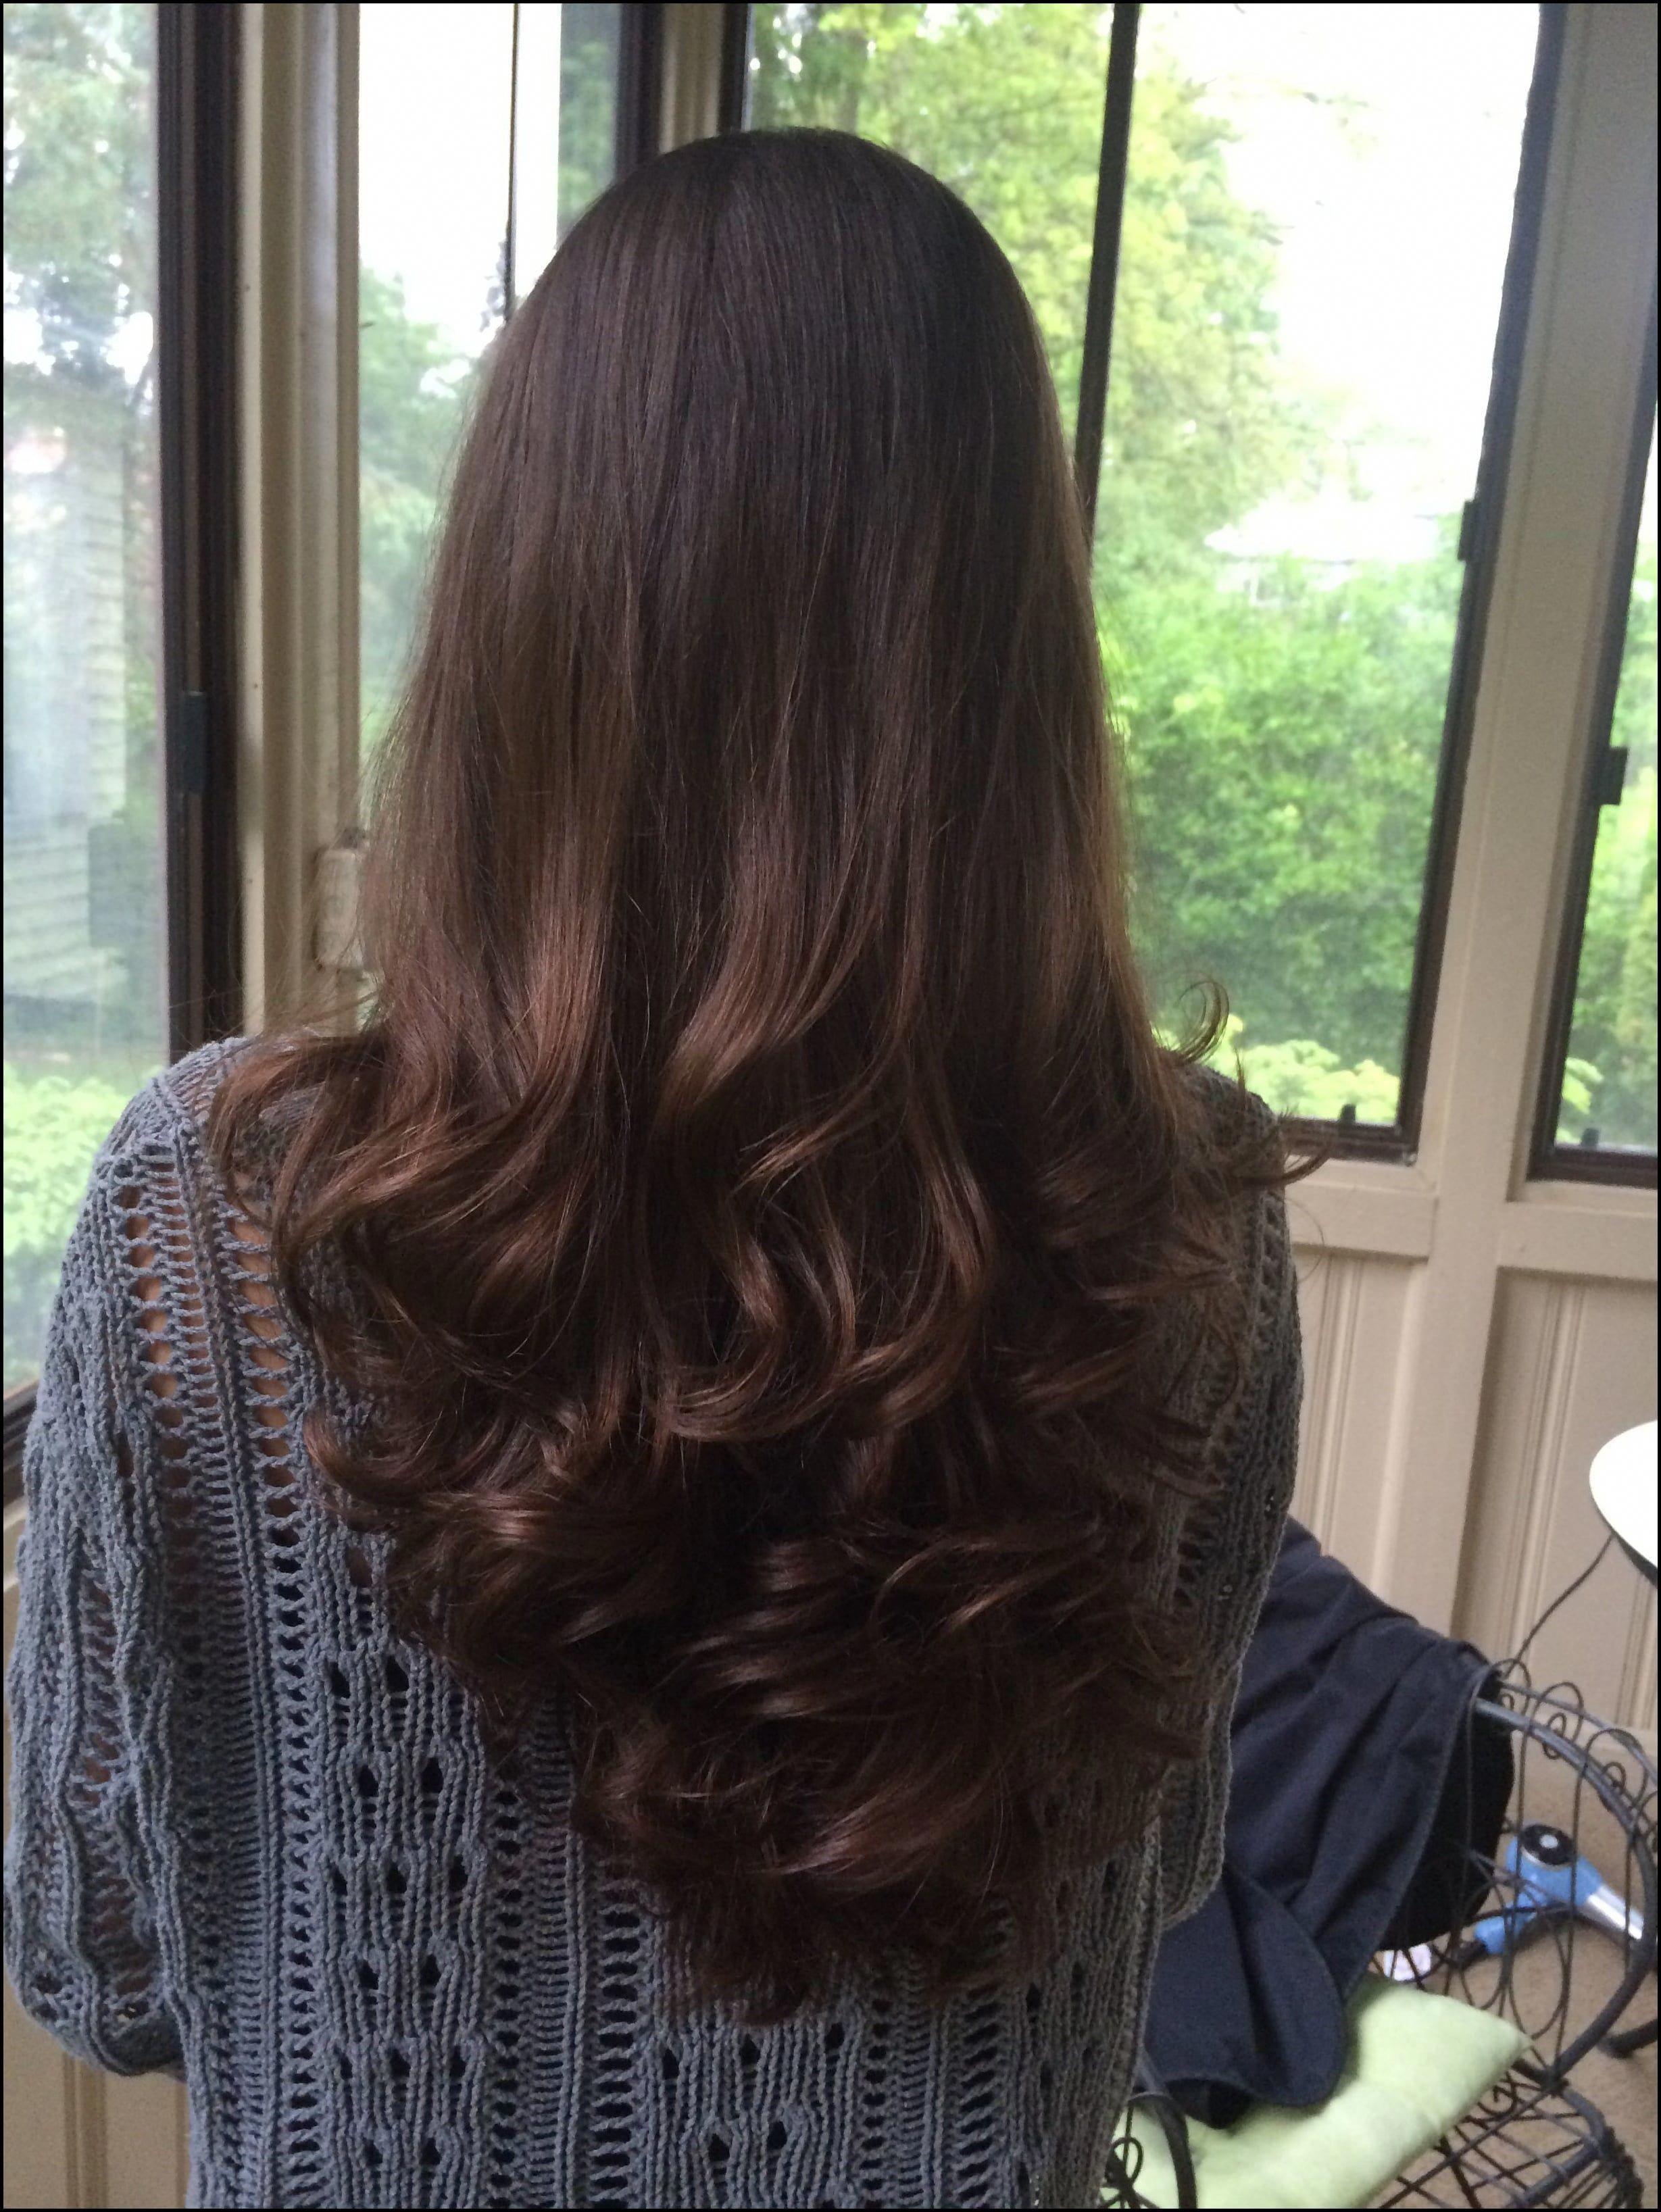 Long Layered Victoria Secret V Shape Haircut With Curls Wish My Diyh Haircuts For Long Hair With Layers Haircuts For Long Hair Haircuts For Medium Hair